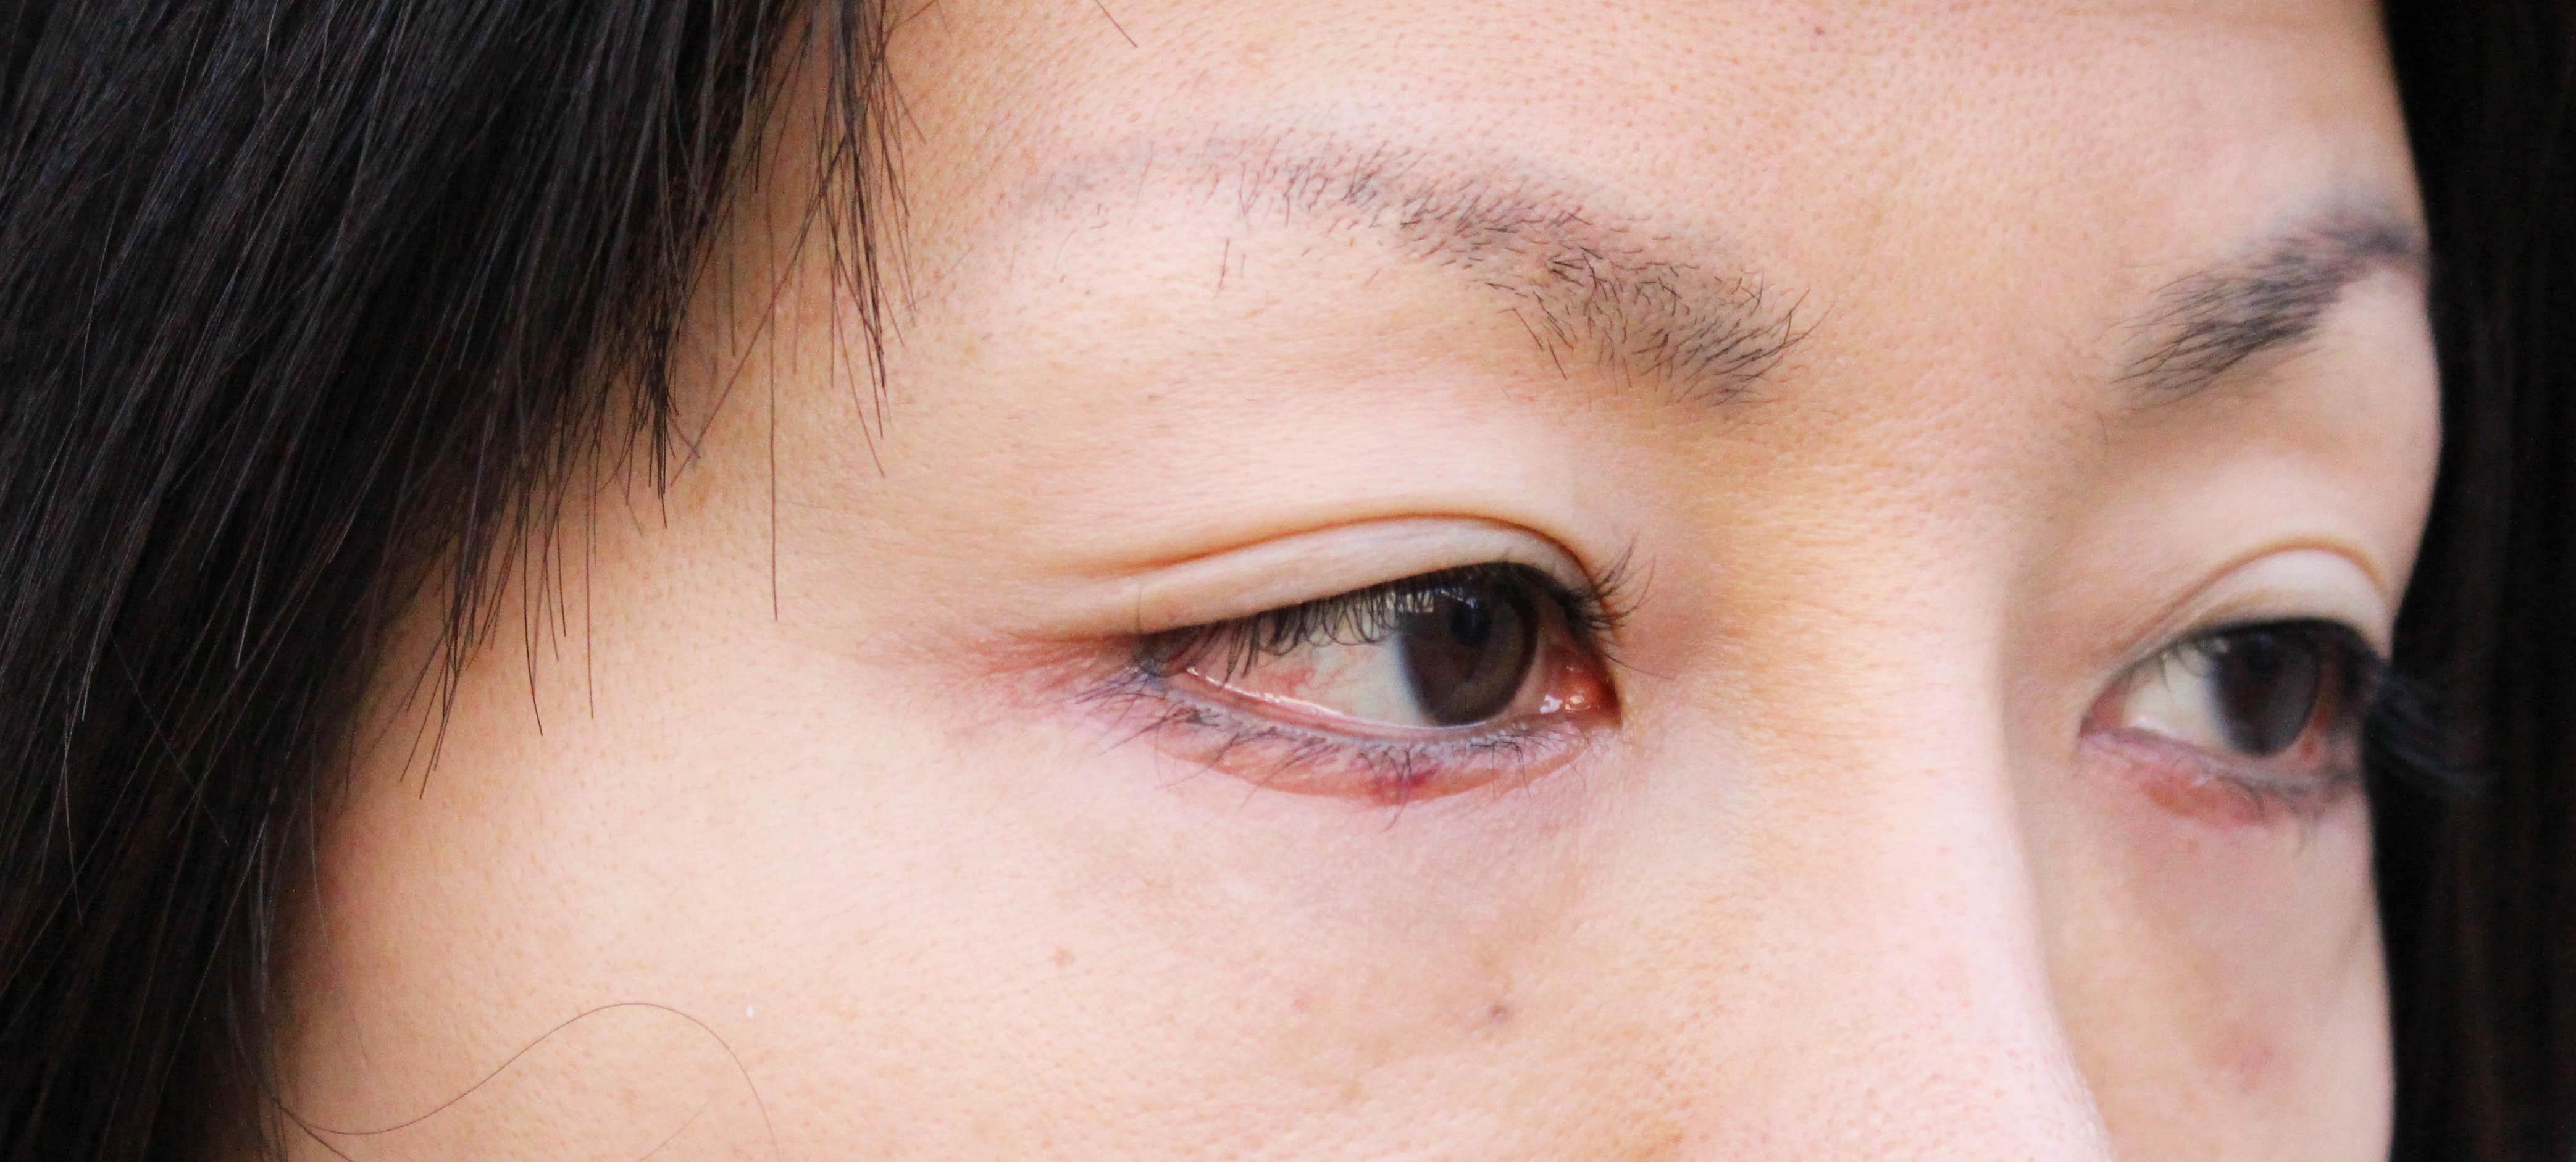 hamura28-1 - image